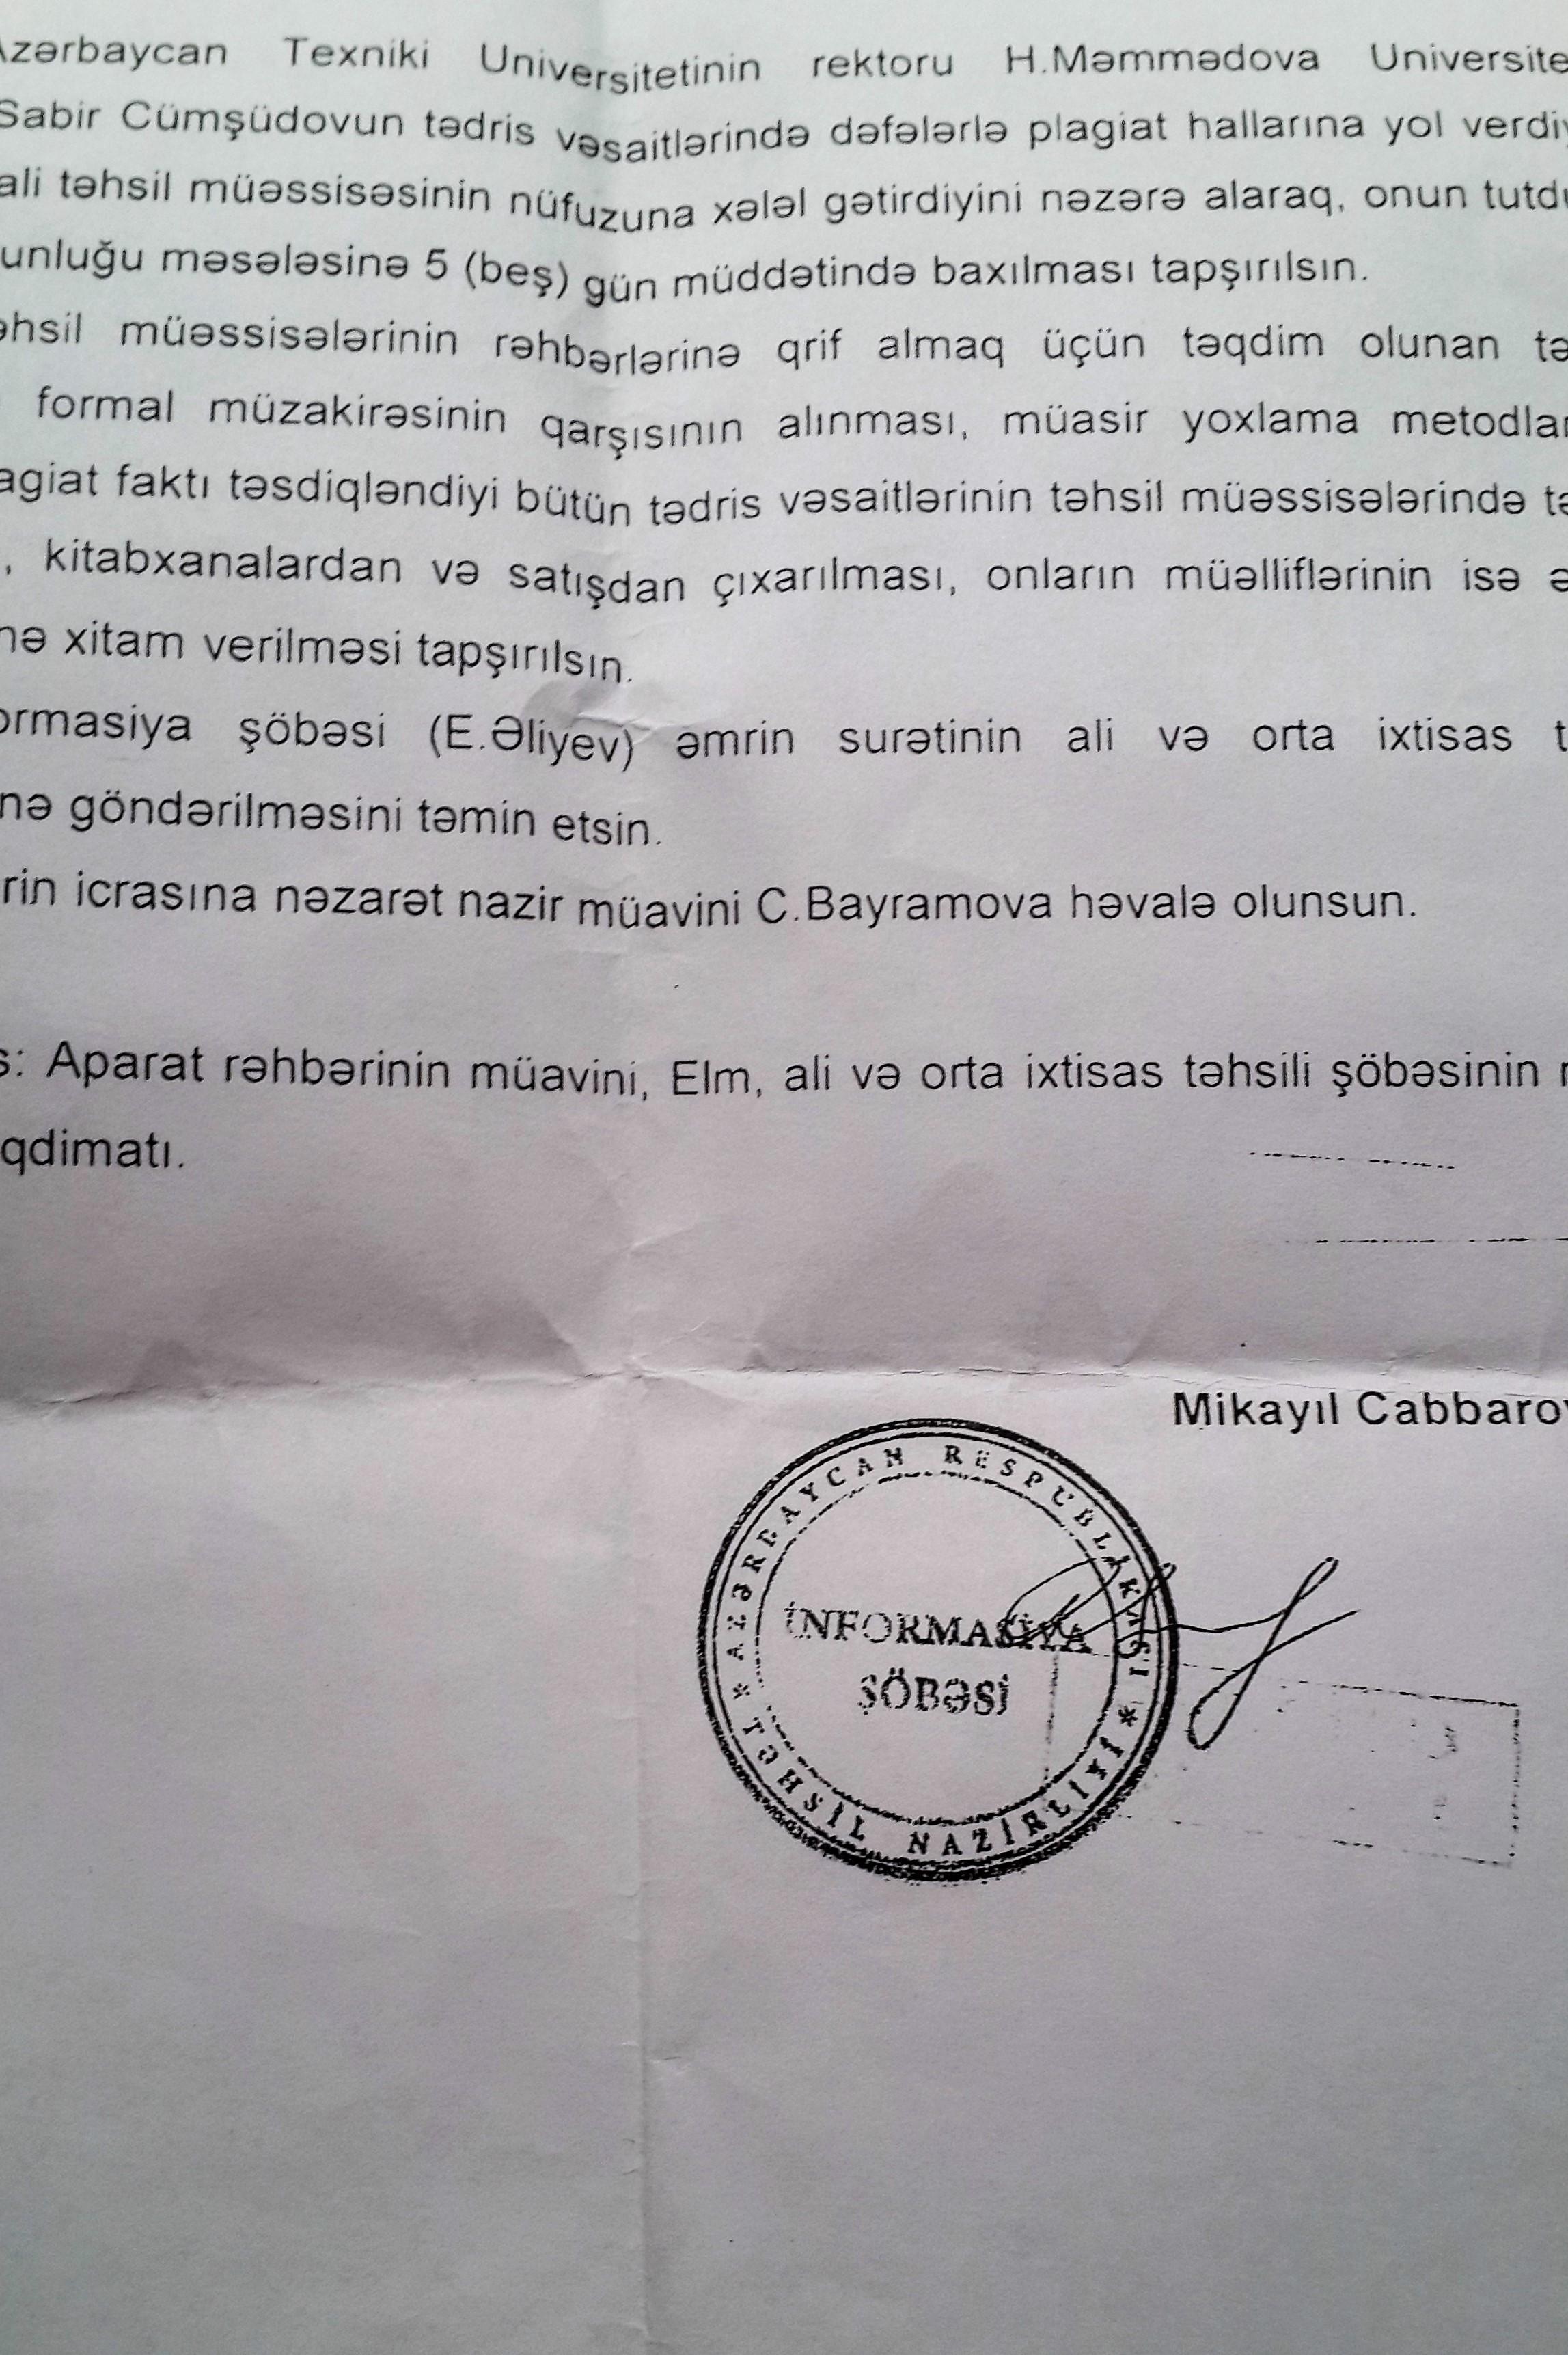 emr-mikayil-2